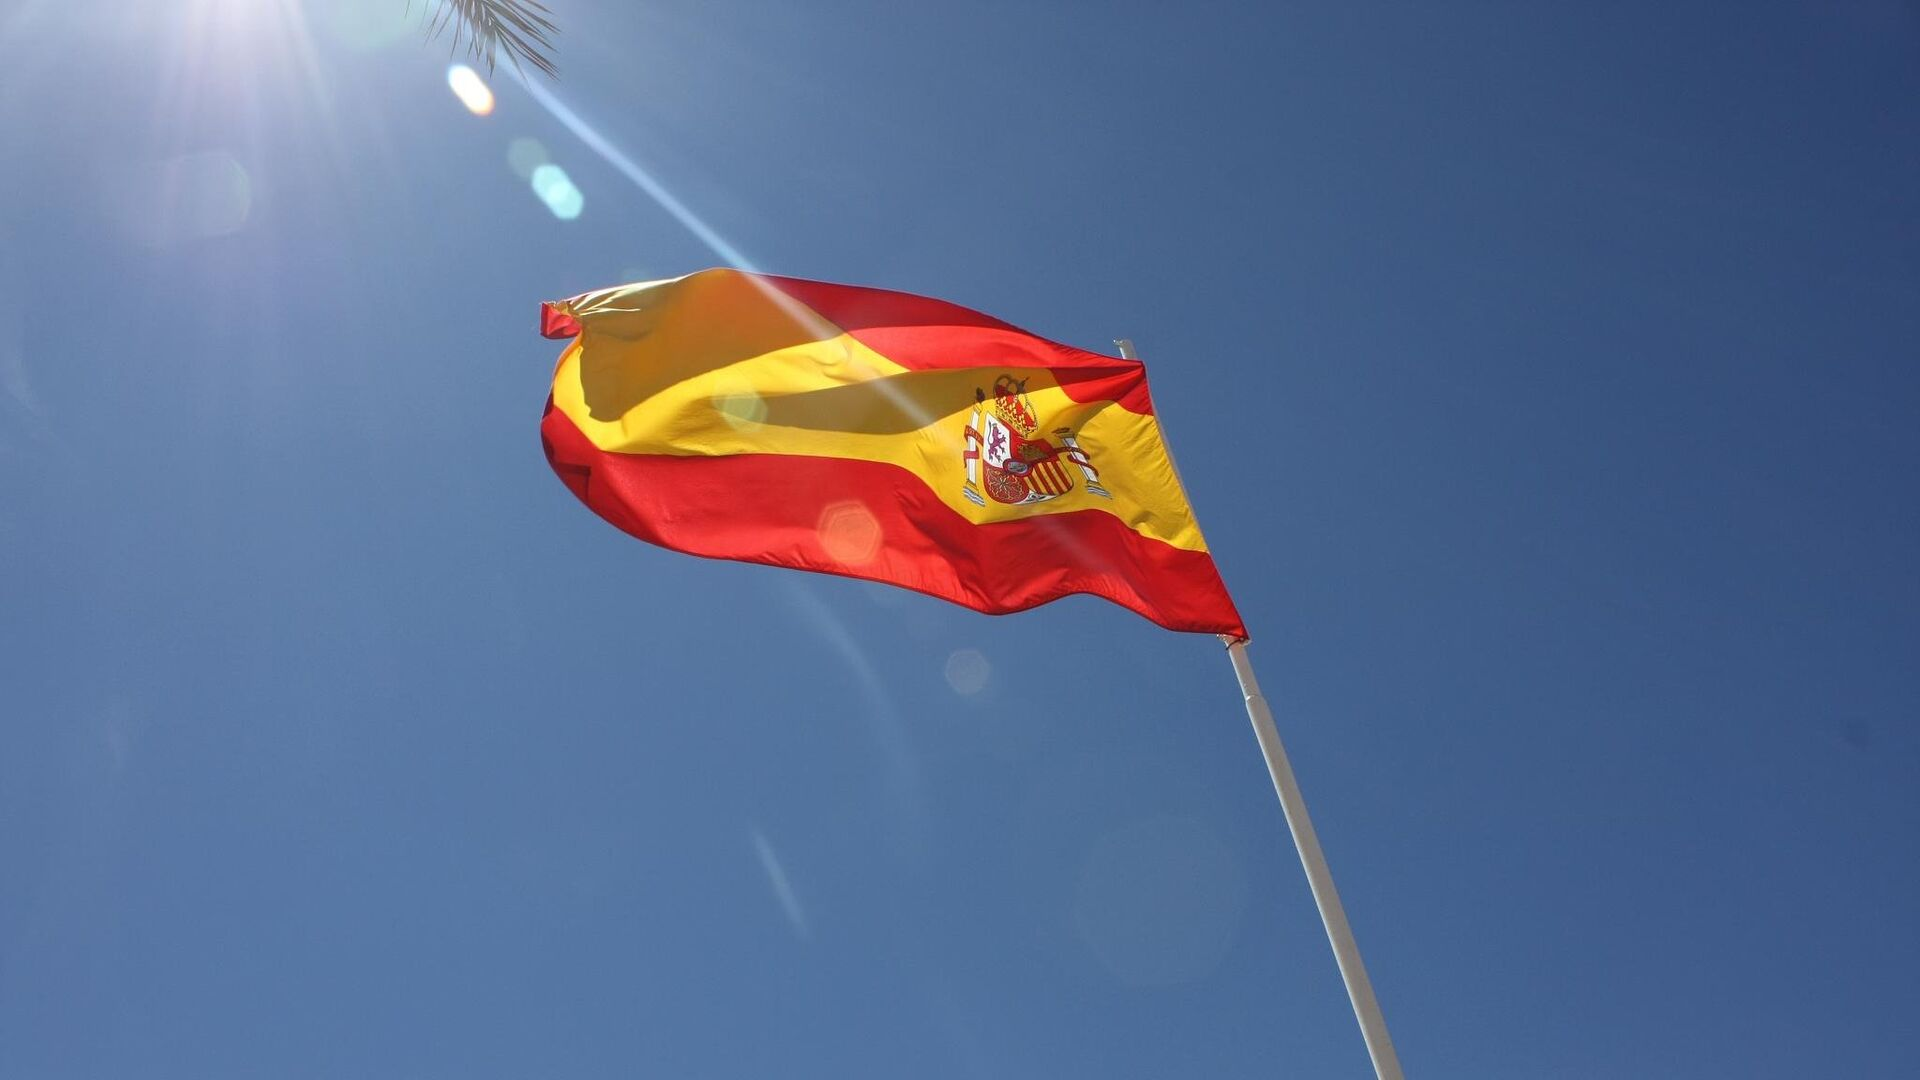 Bandera de España - Sputnik Mundo, 1920, 19.04.2021